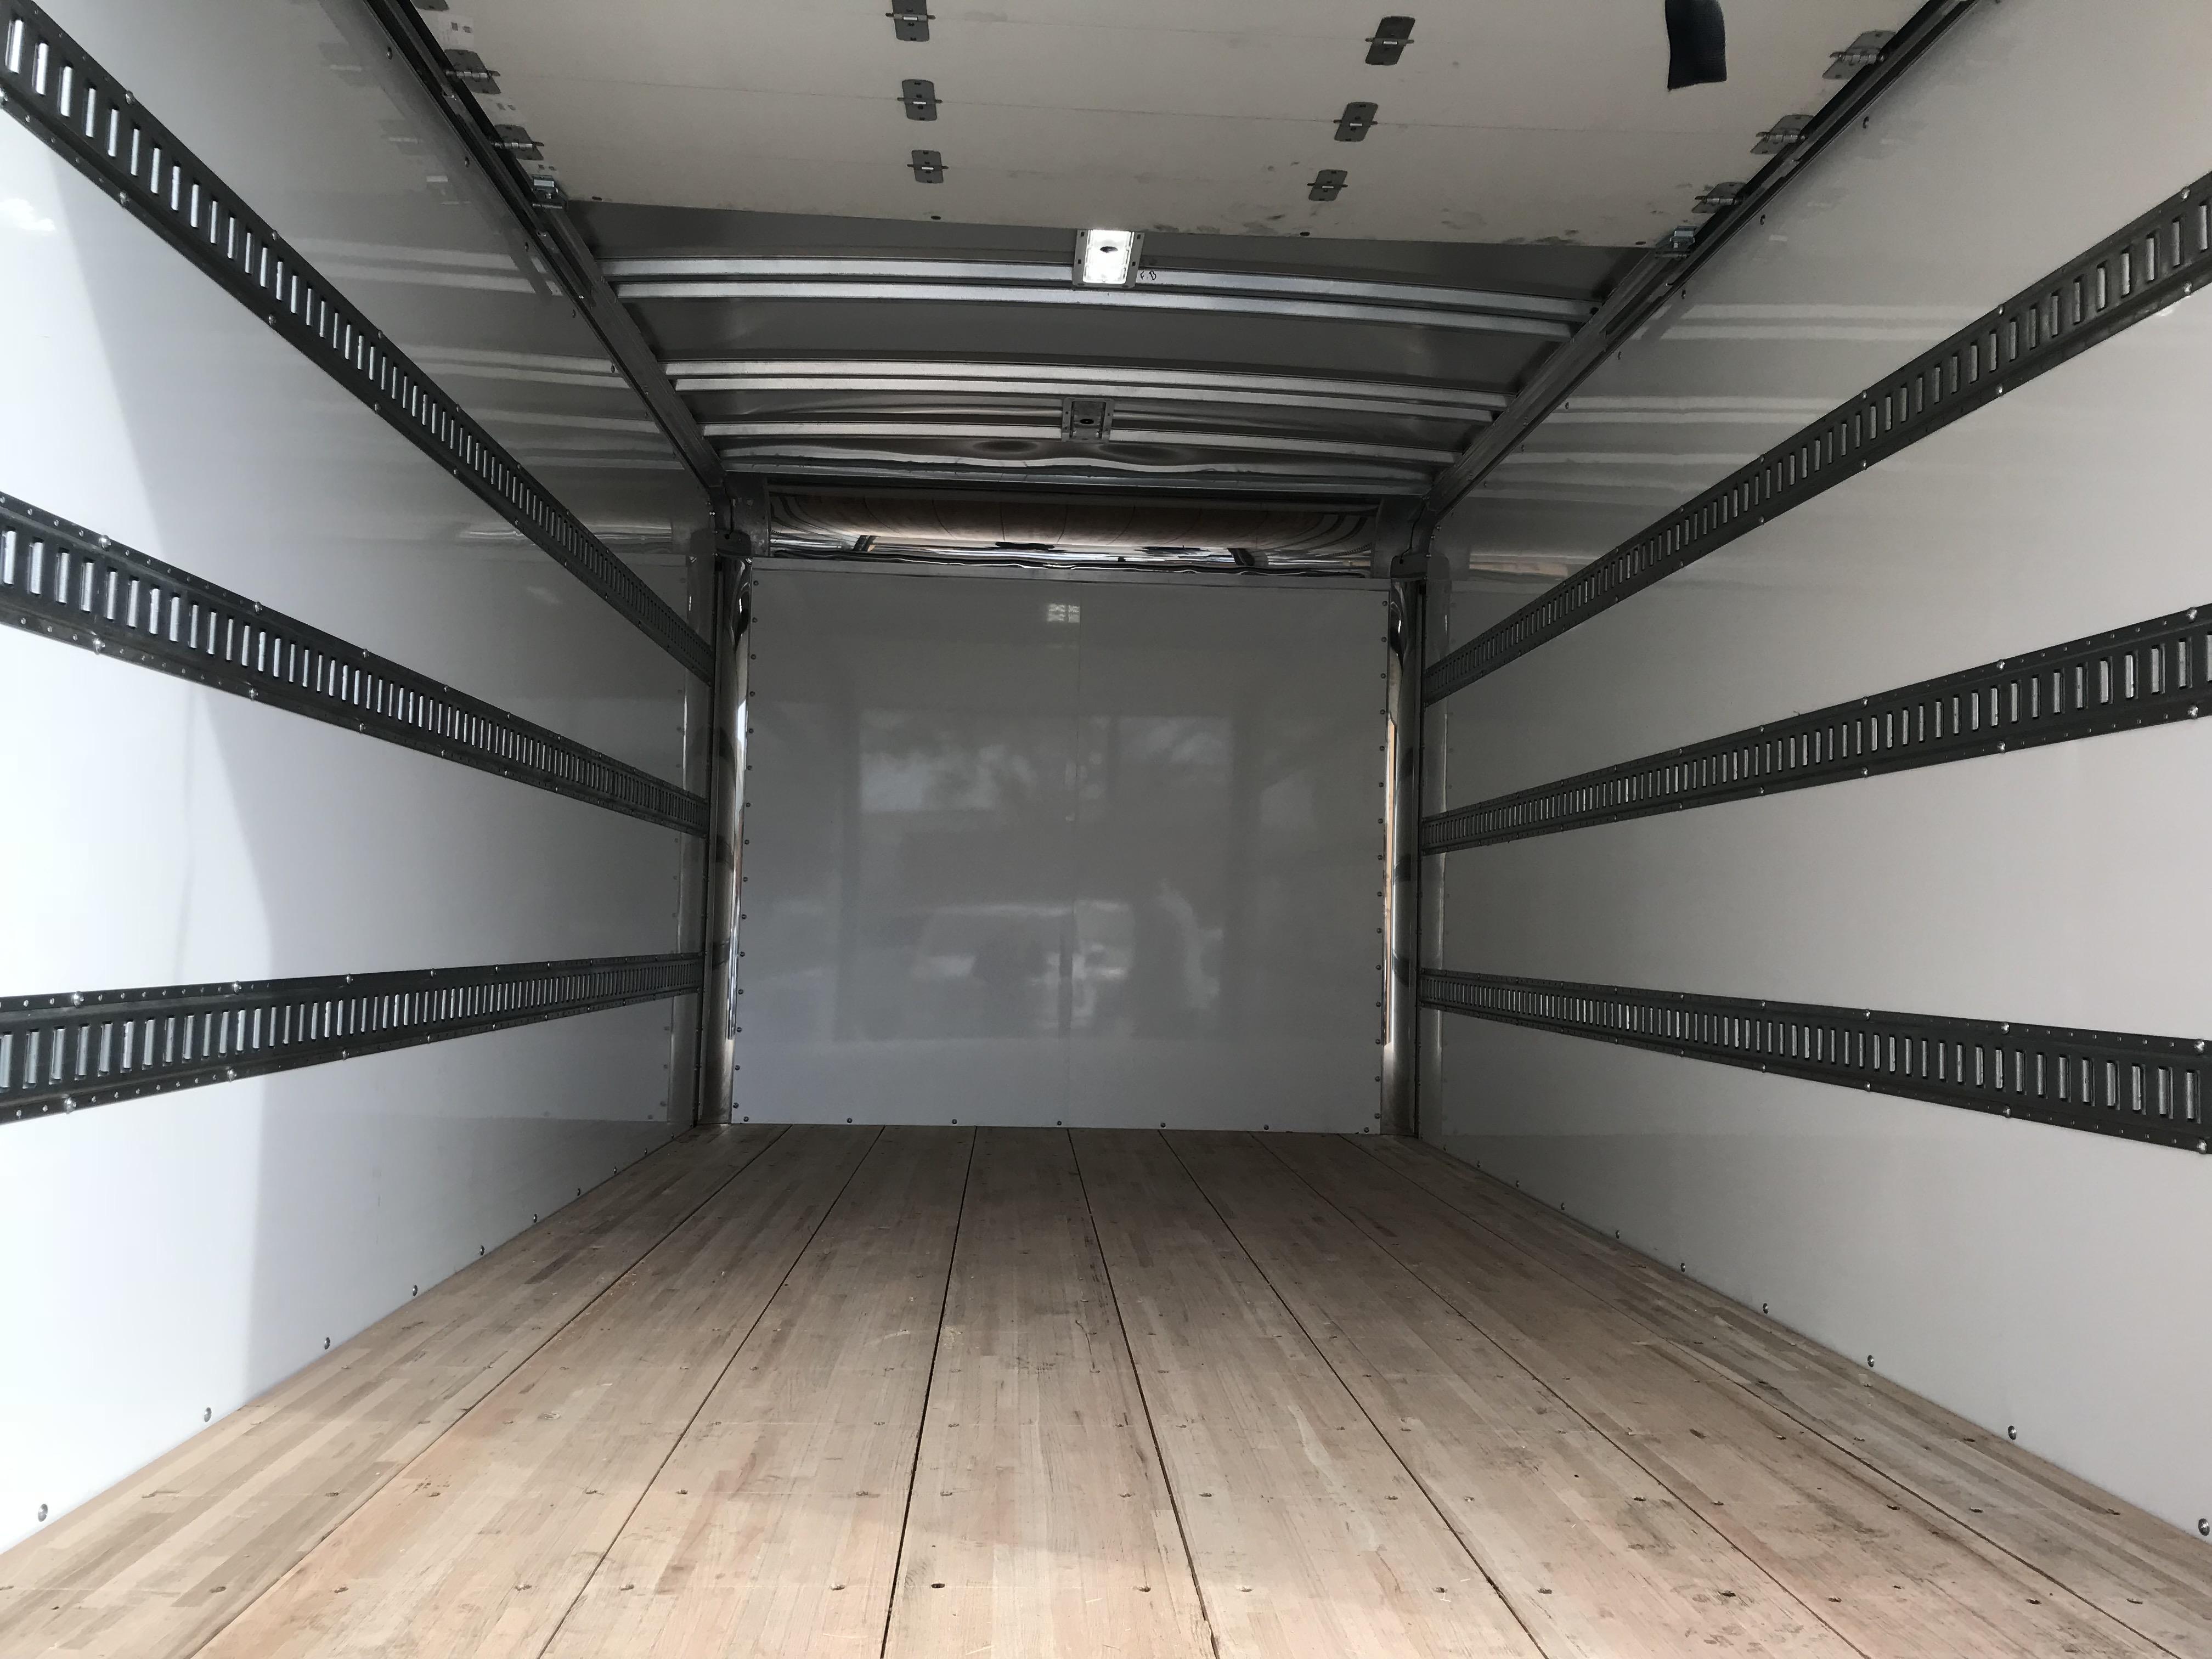 Sprinter Box Truck interior close